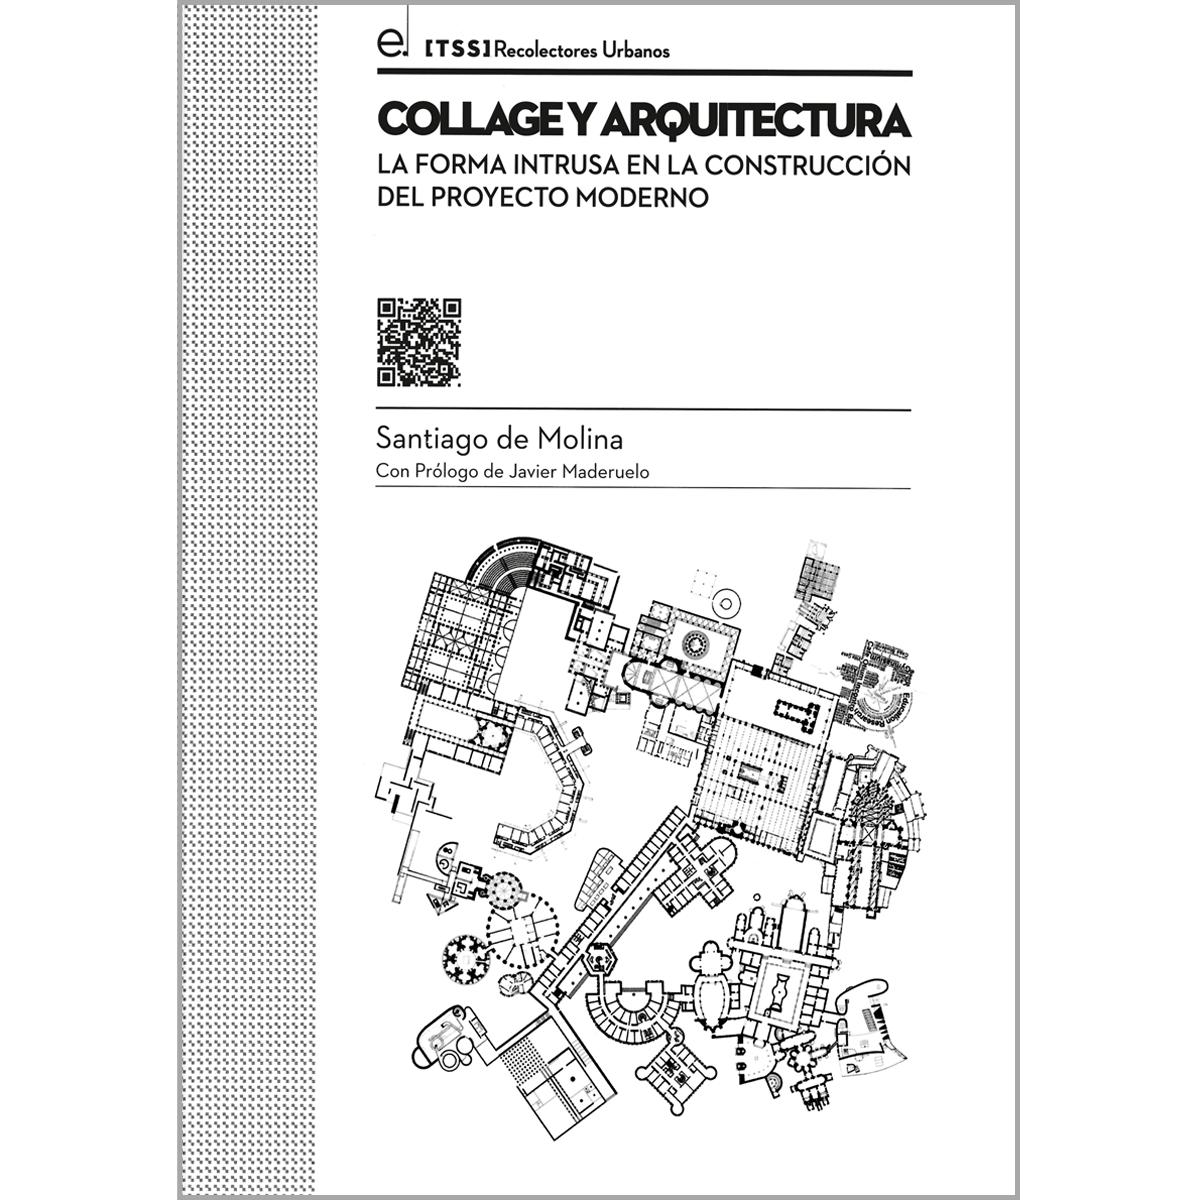 Collage y Arquitectura